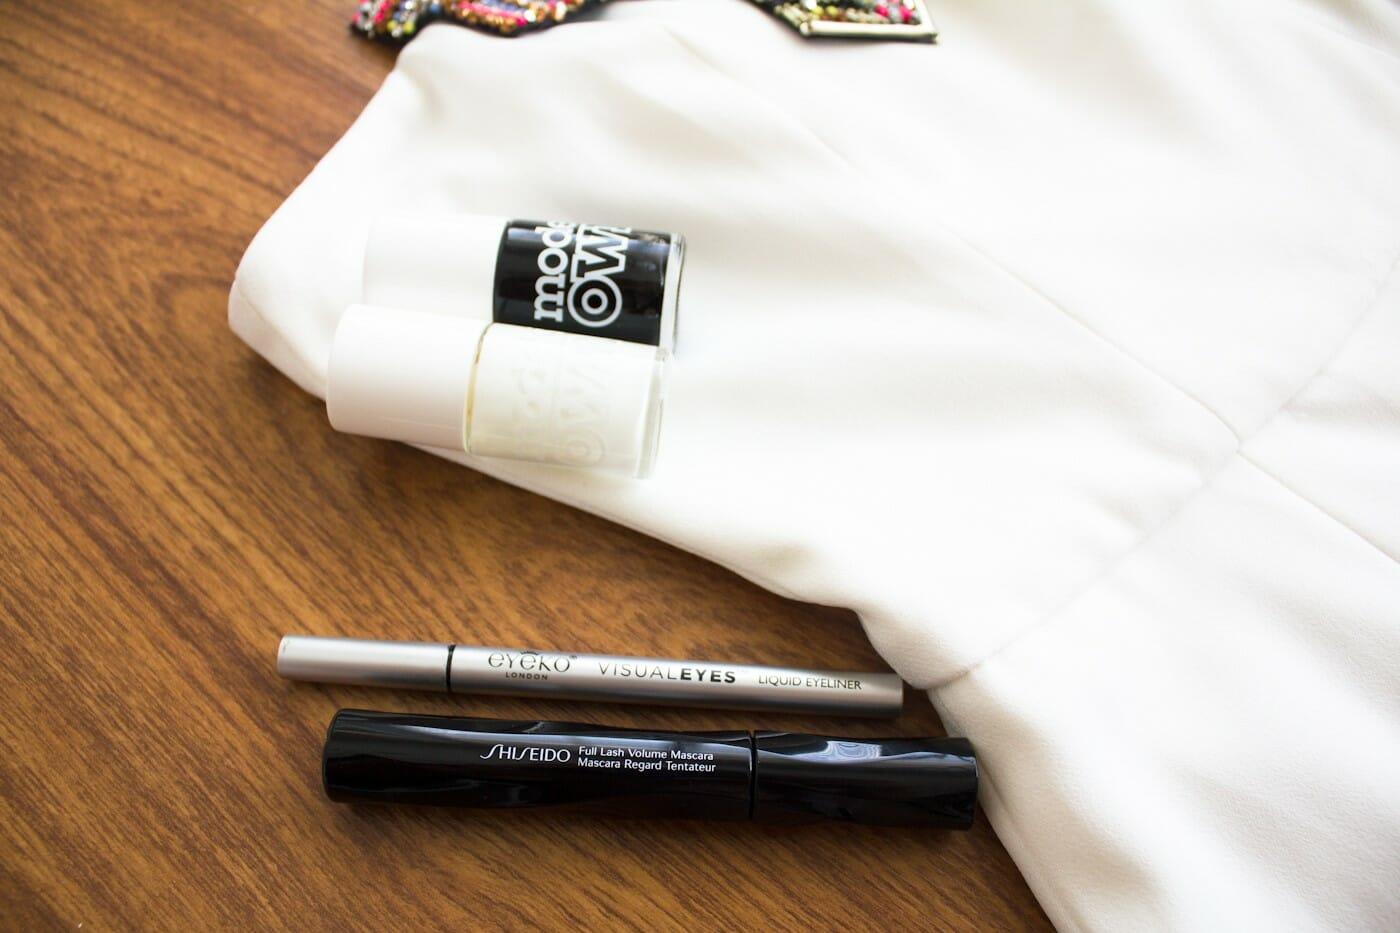 Nail polish from Models Own, eyeliner from Eyeko, mascara from Shiseido